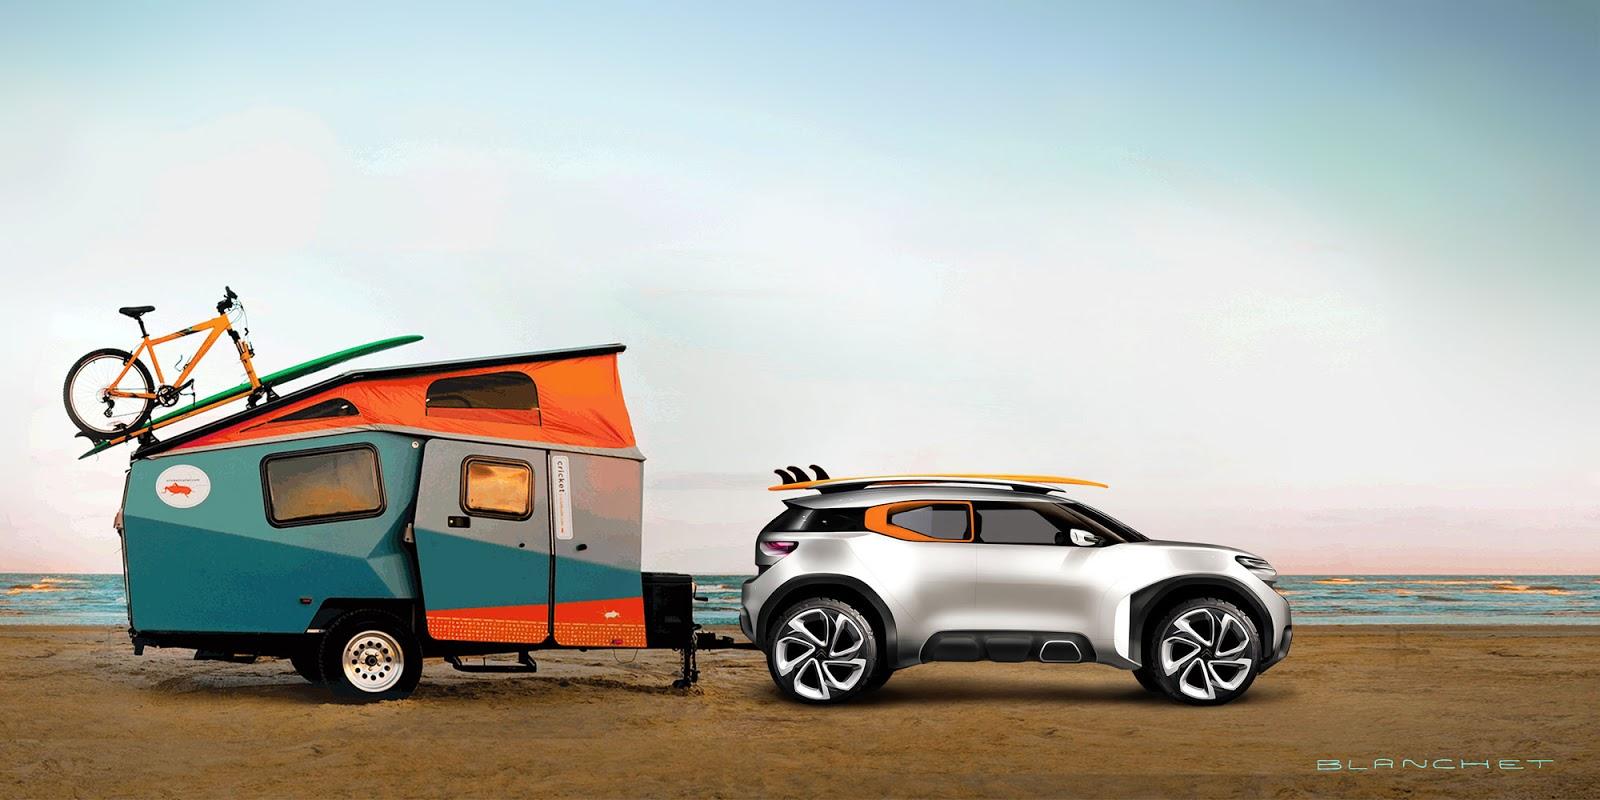 Citroen Aircross concept 2015 plus caravan, sketch by Gregory Blanchet